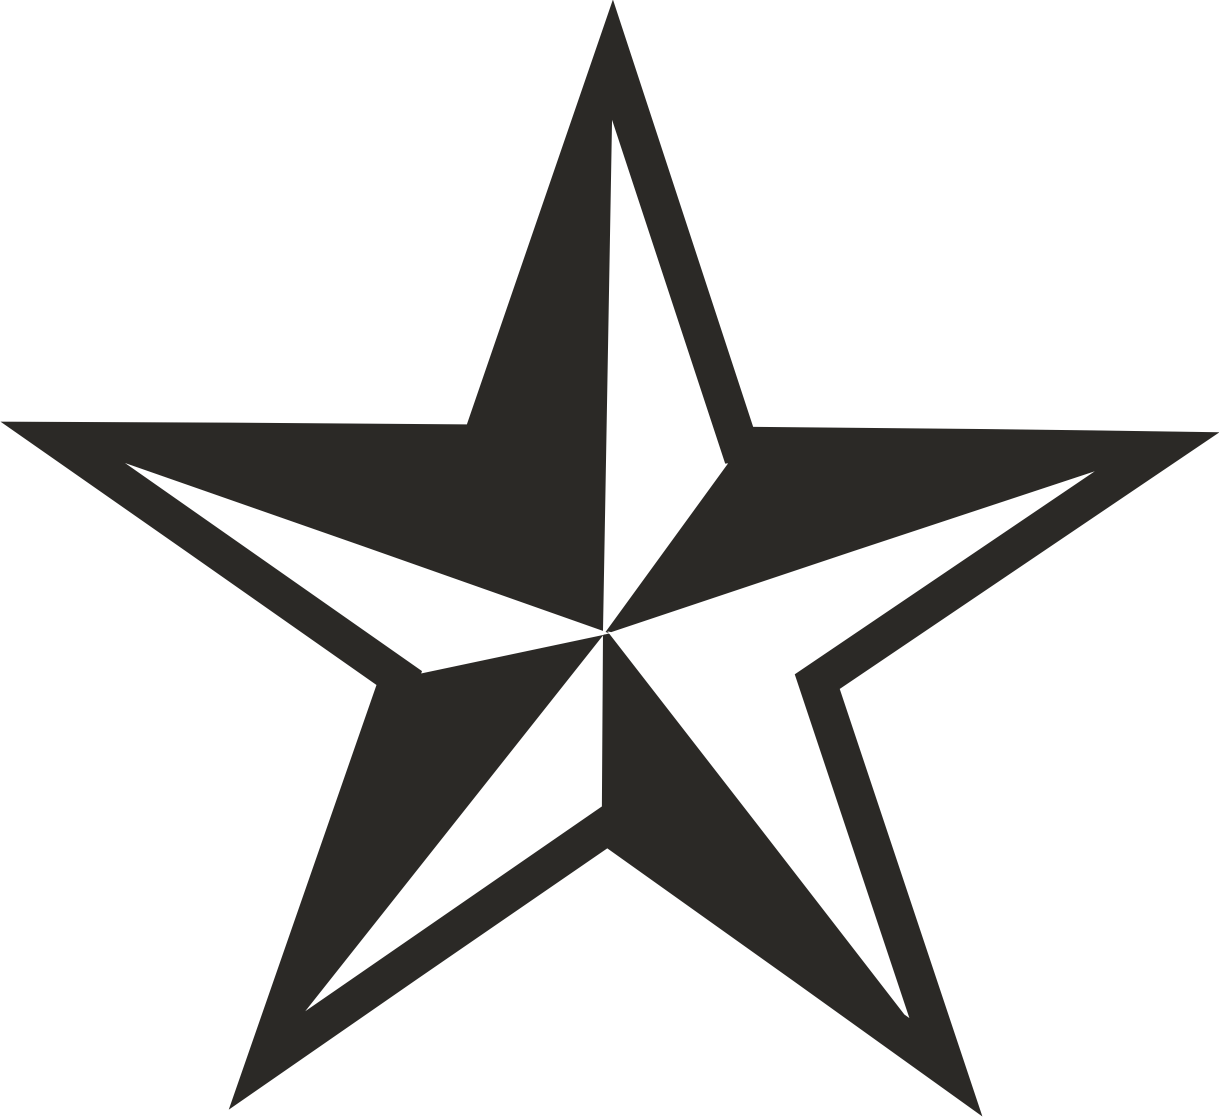 Stars vector clipart svg transparent download Free Free Star Vectors, Download Free Clip Art, Free Clip ... svg transparent download